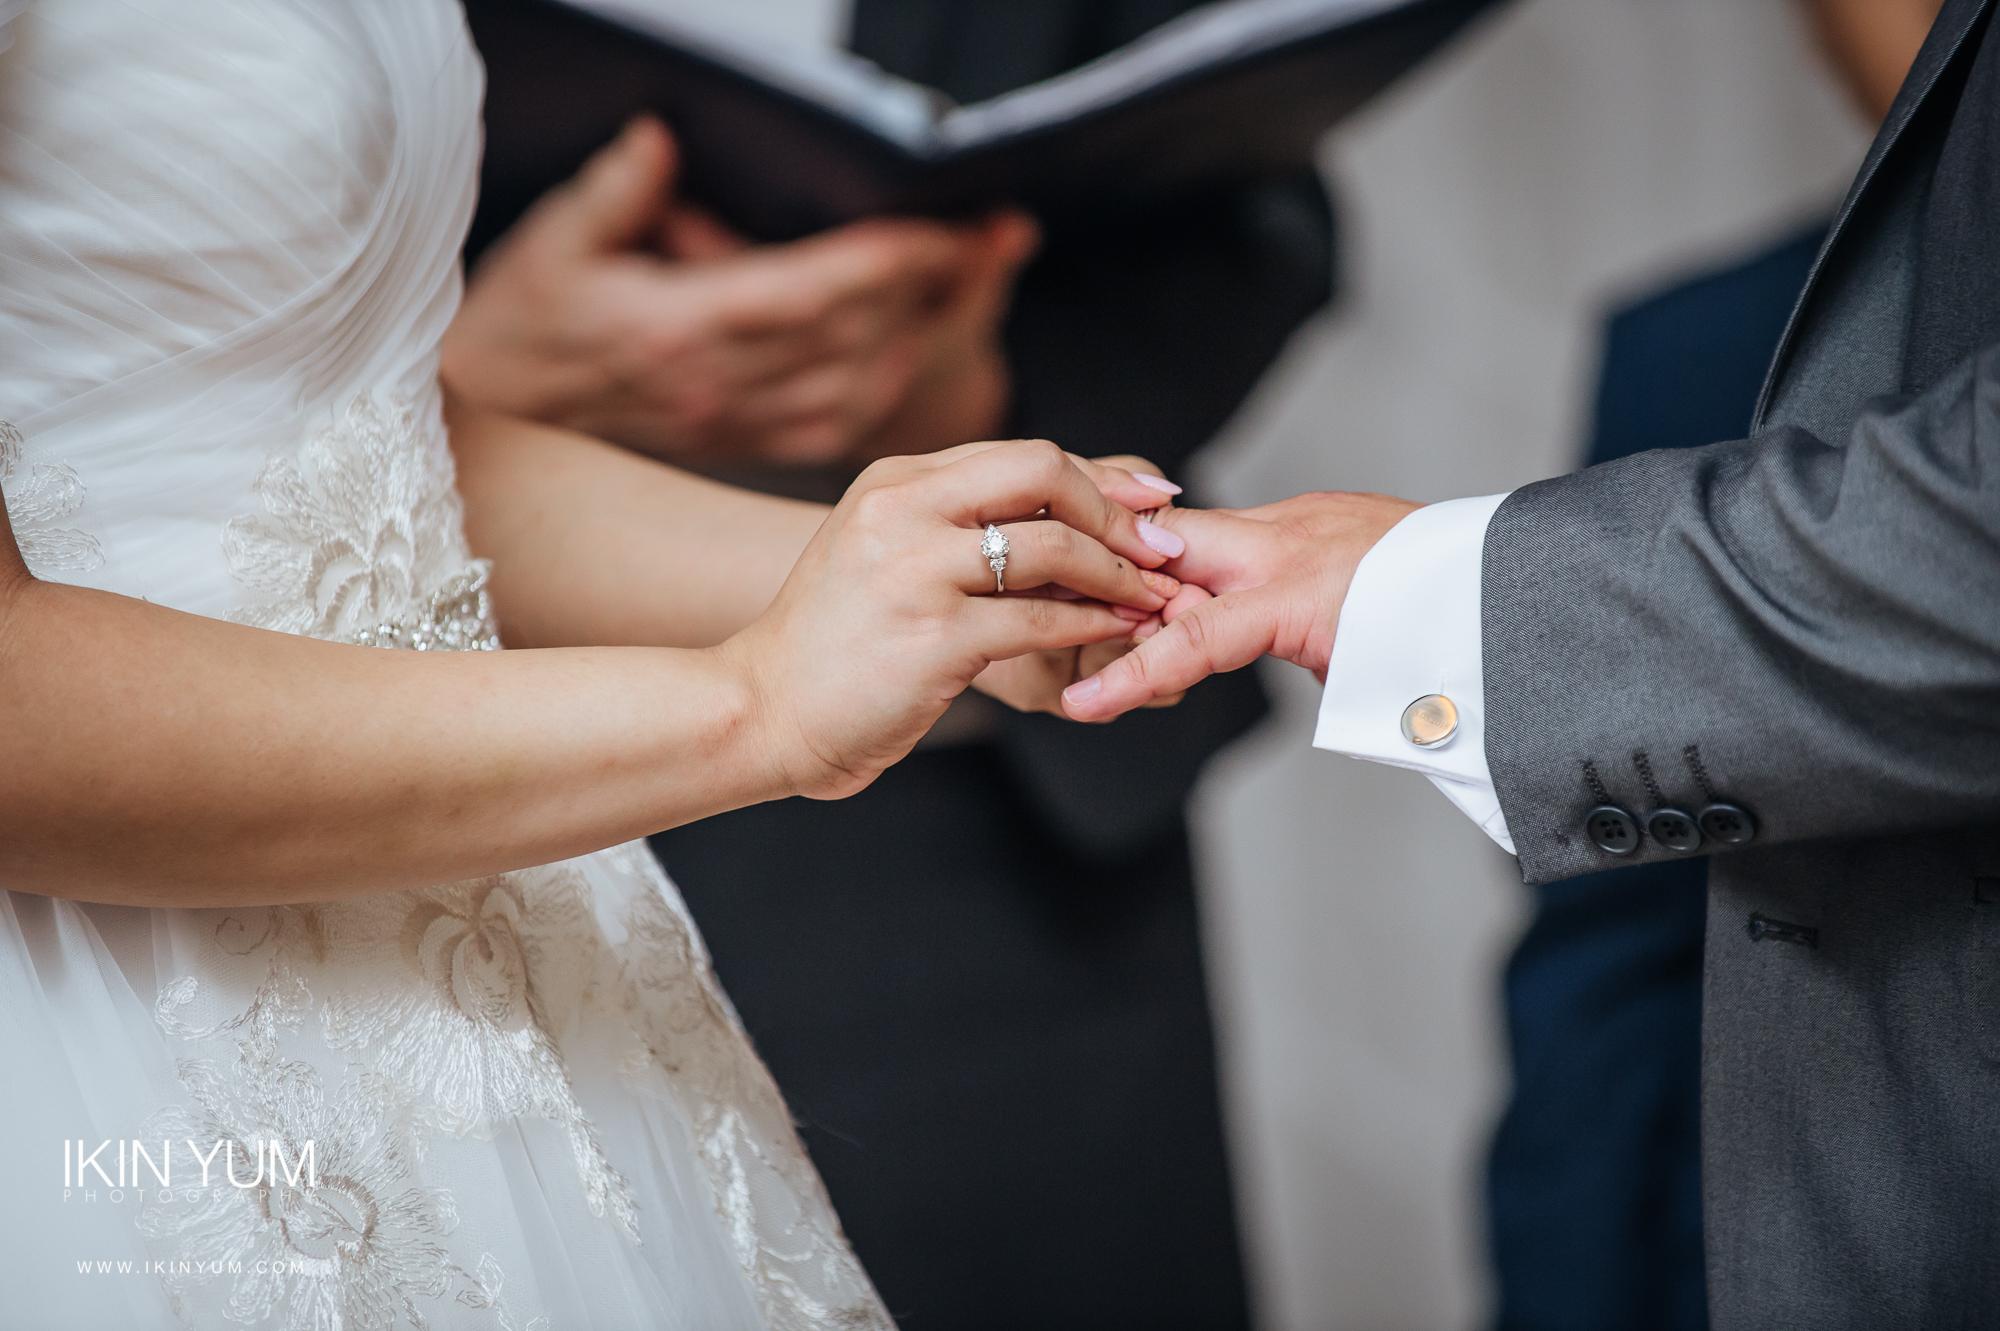 Hampton Manor Wedding - Ikin Yum Photography -081.jpg